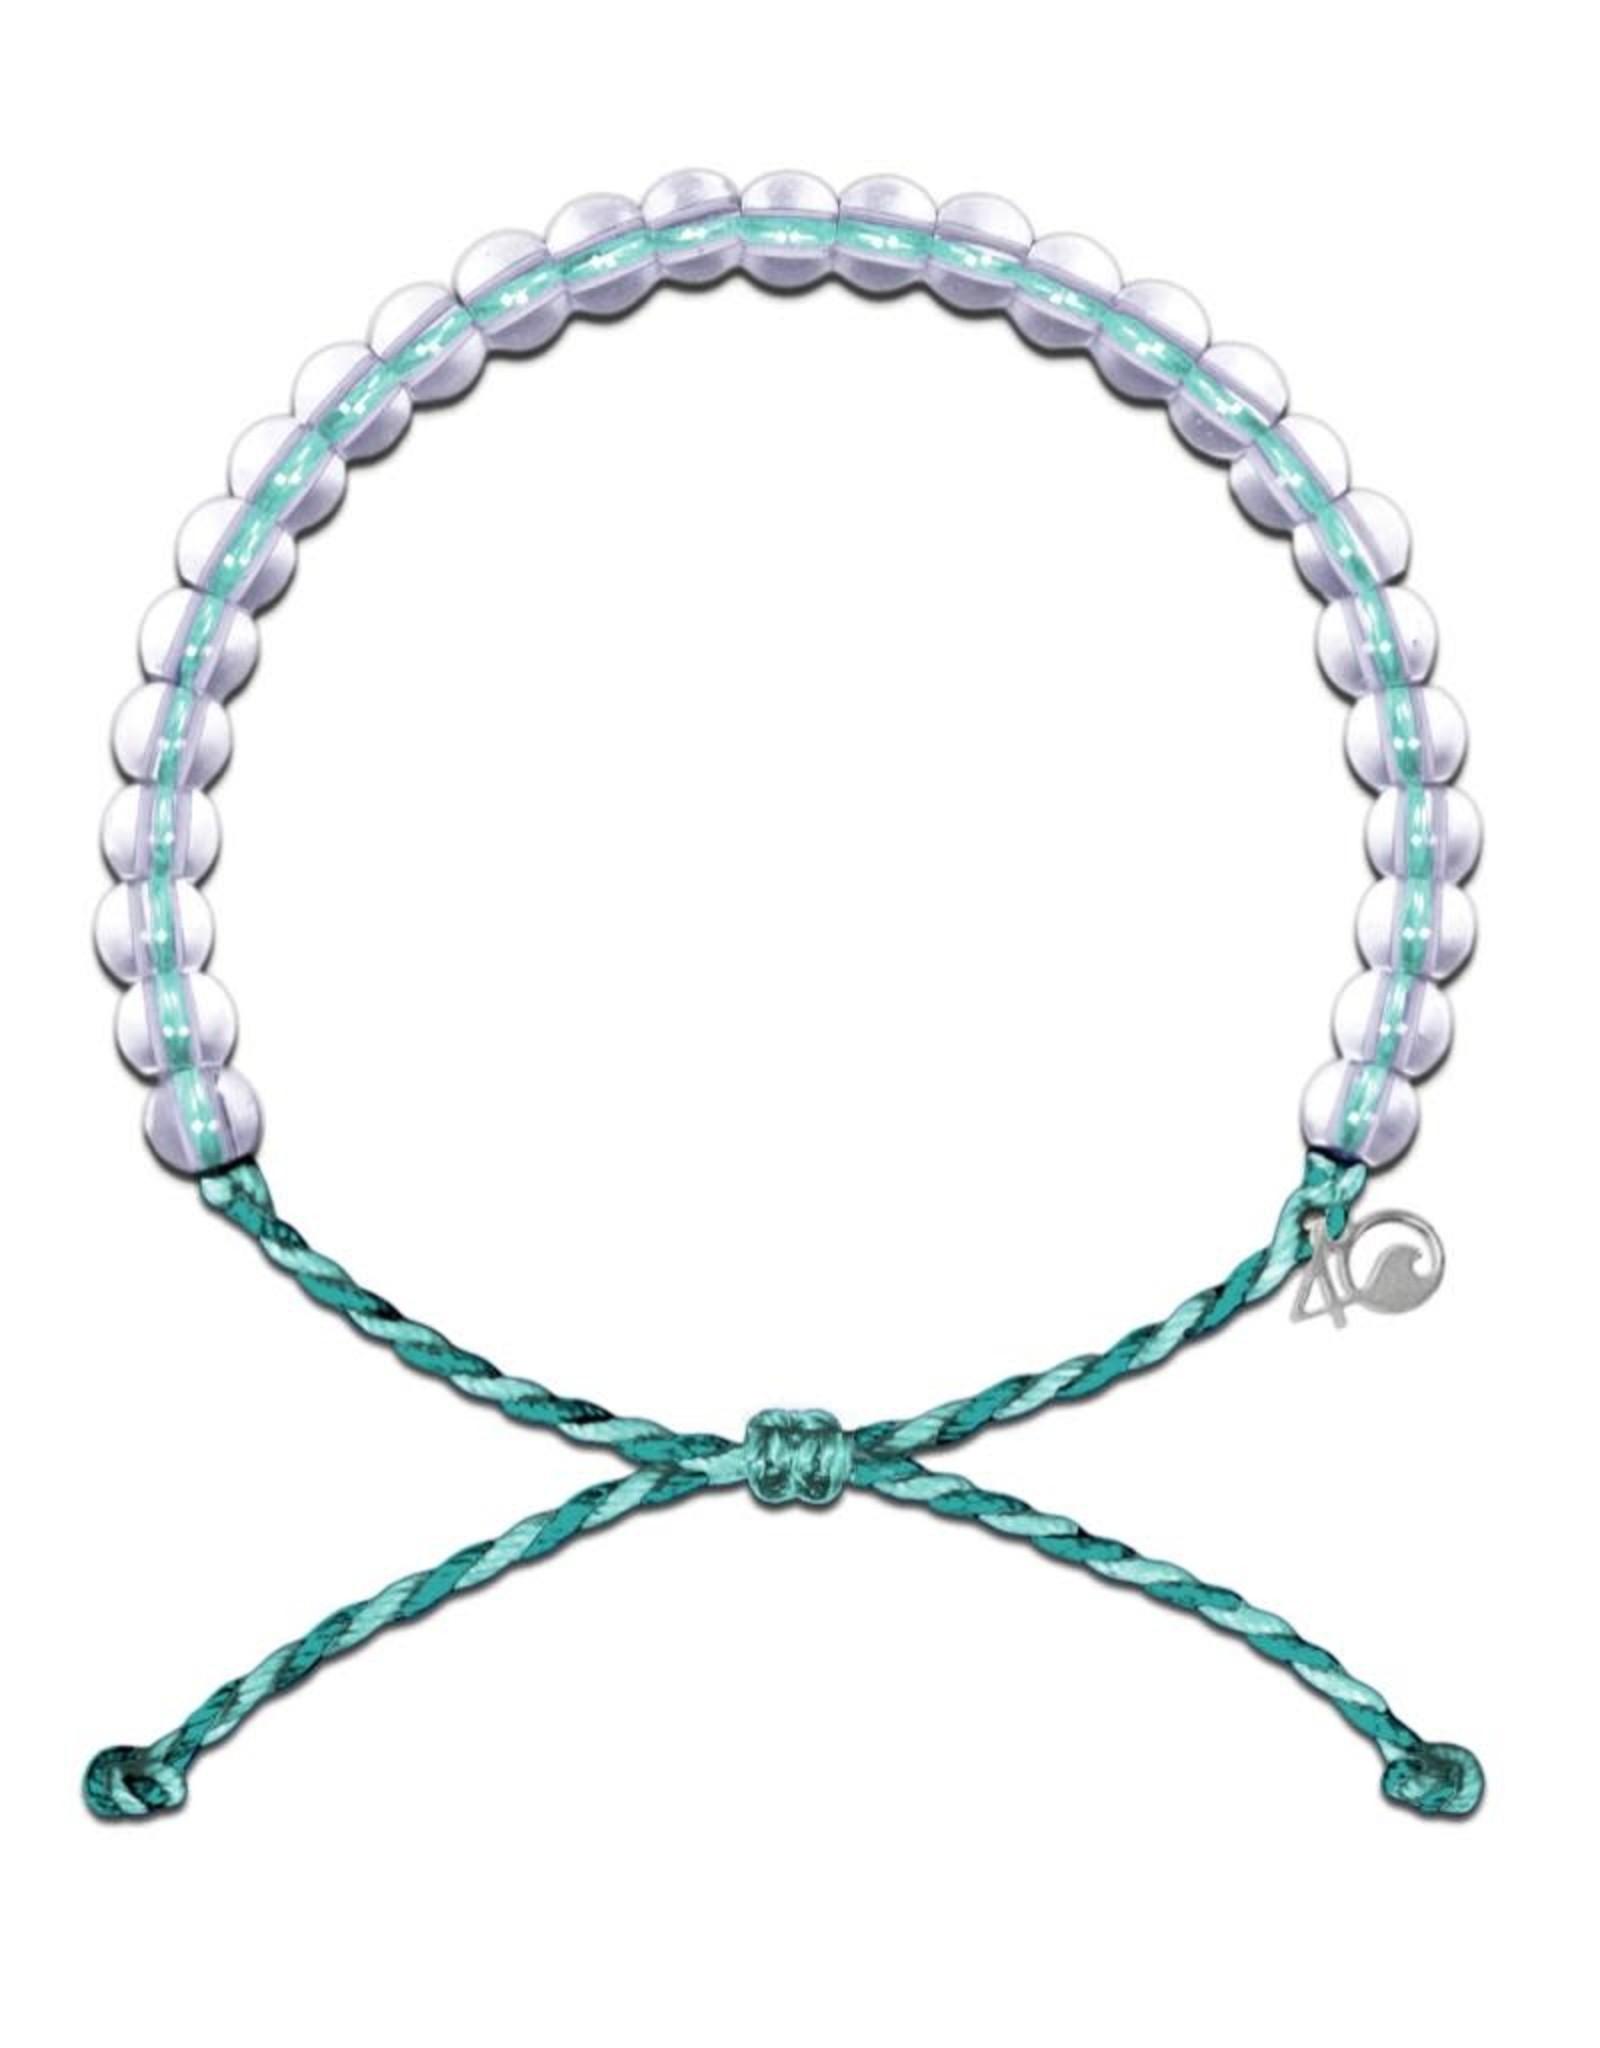 4Ocean Beaded Bracelet Manta Ray